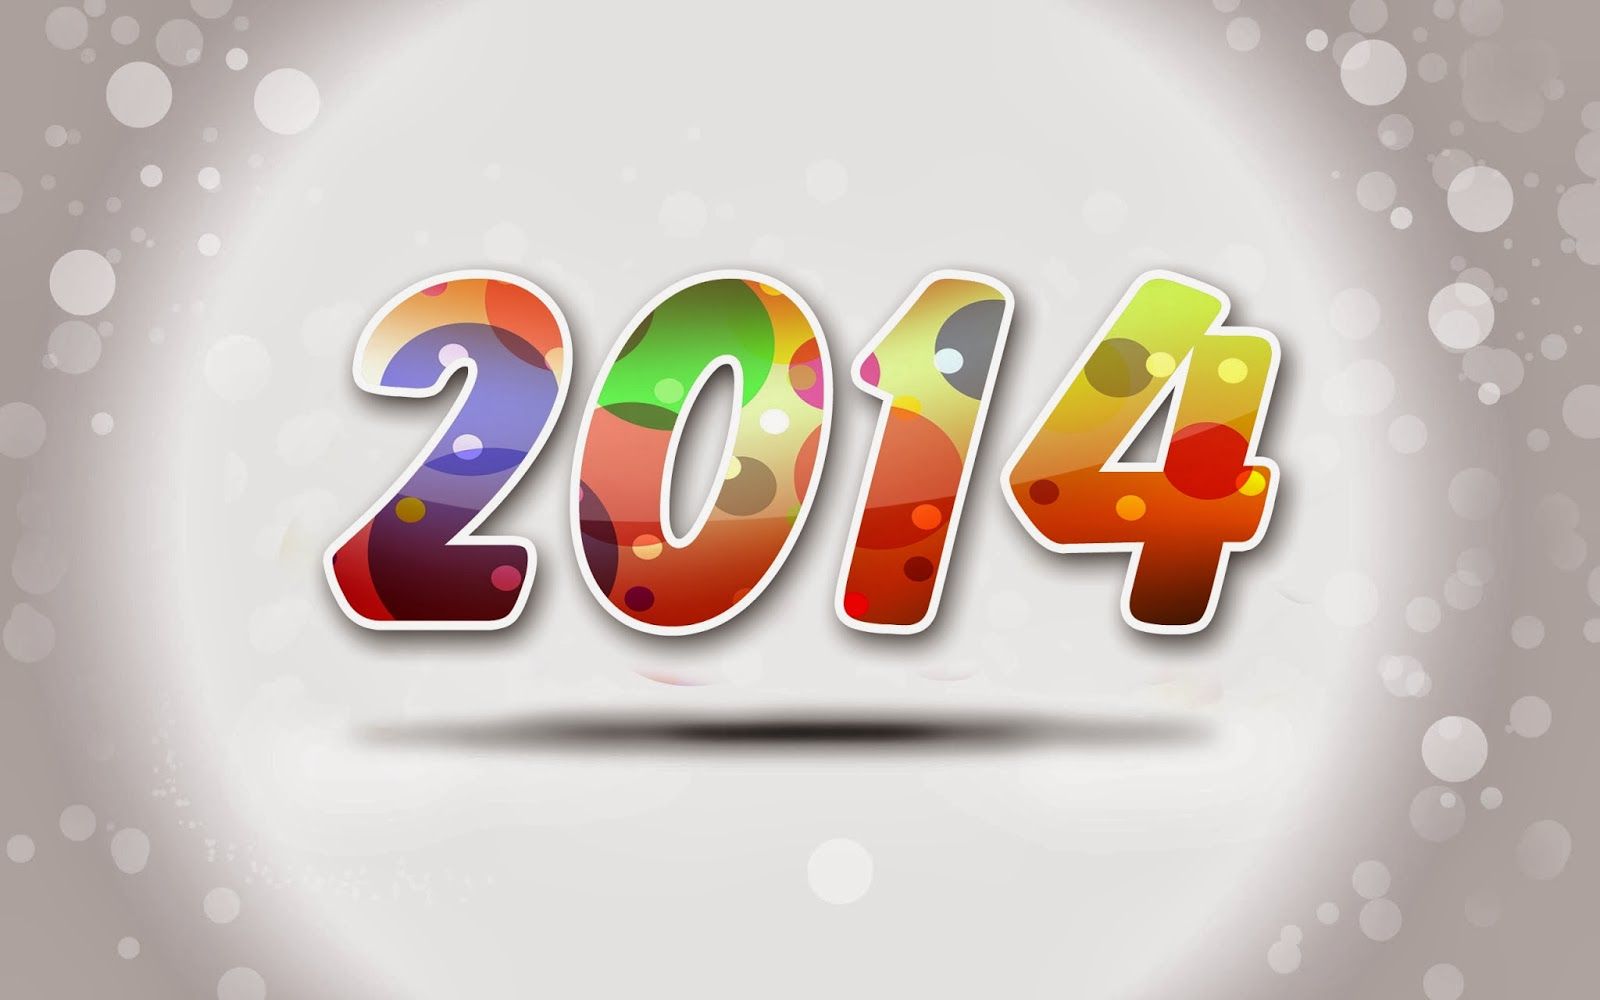 Beautiful Wallpaper: New Year Wishes 2014 ~ 3D Wallpaper